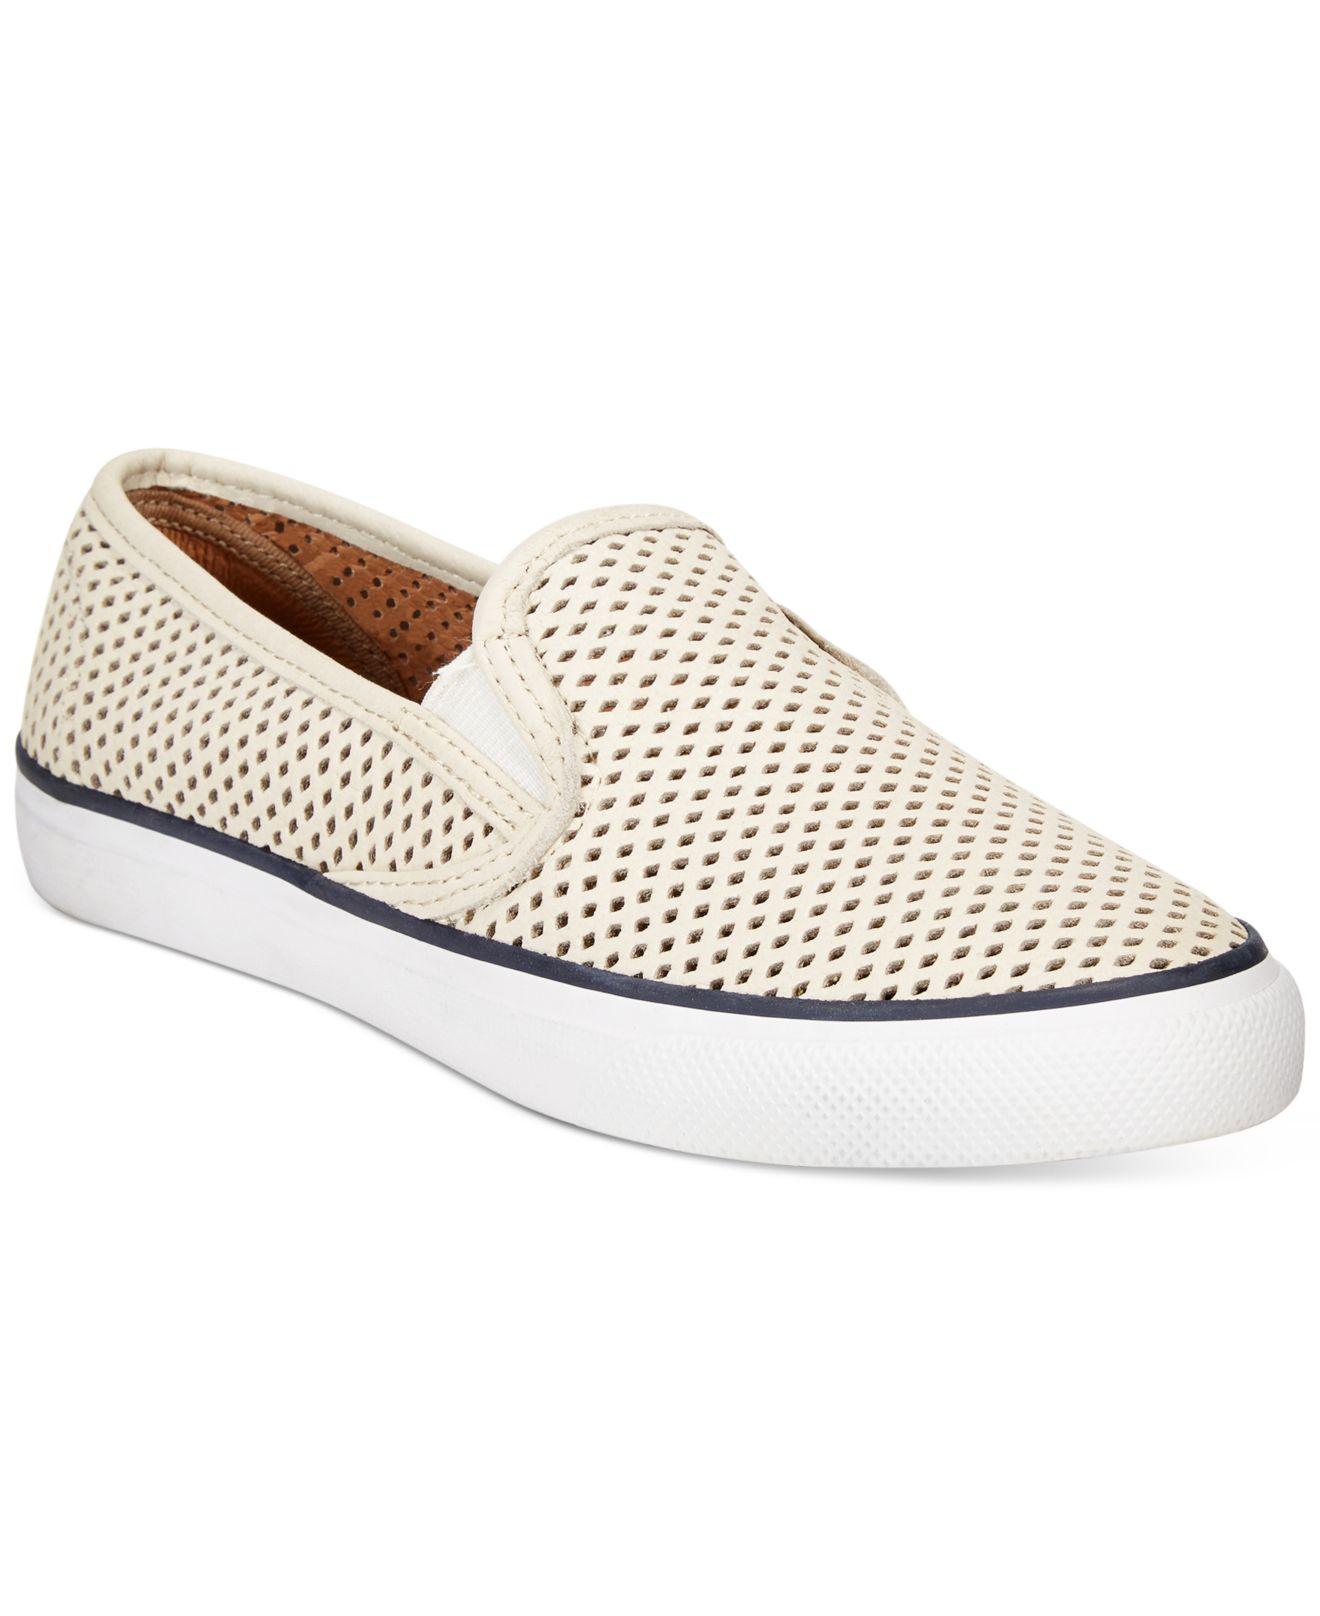 Lyst - Sperry Top-Sider Women s Seaside Slip-on Sneakers in Natural 6b805544f